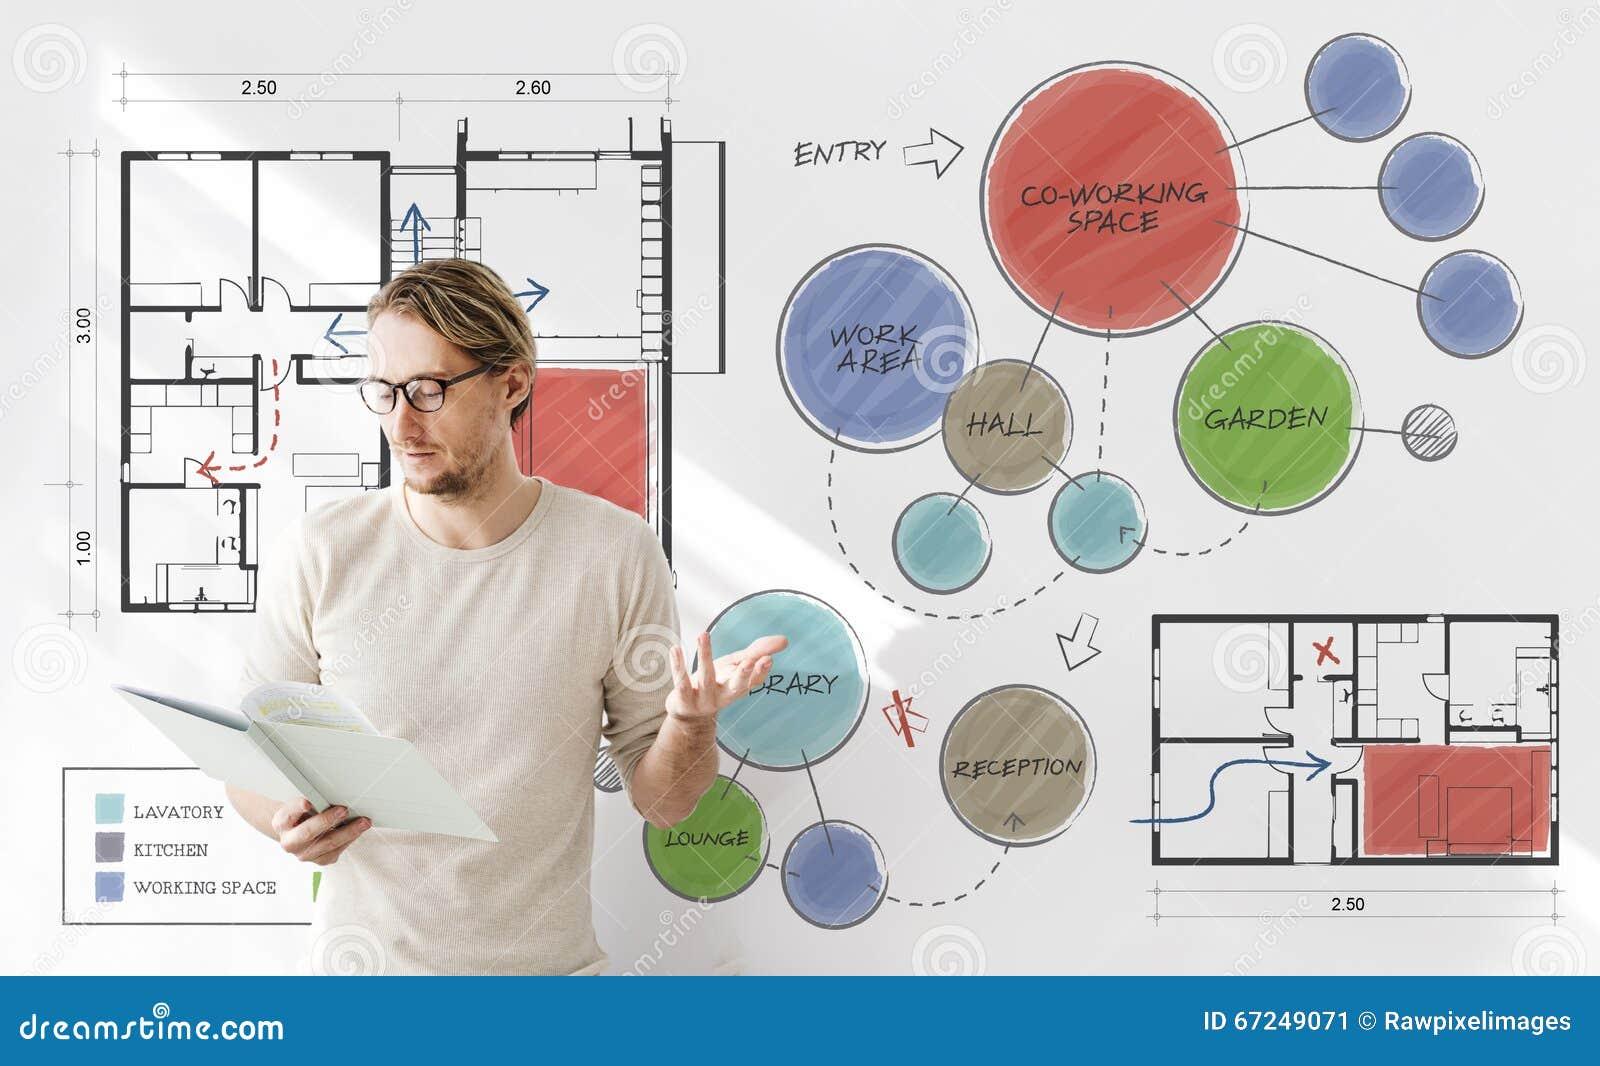 office floor plan sketch drawing concept stock illustration concept drawing floor office plan